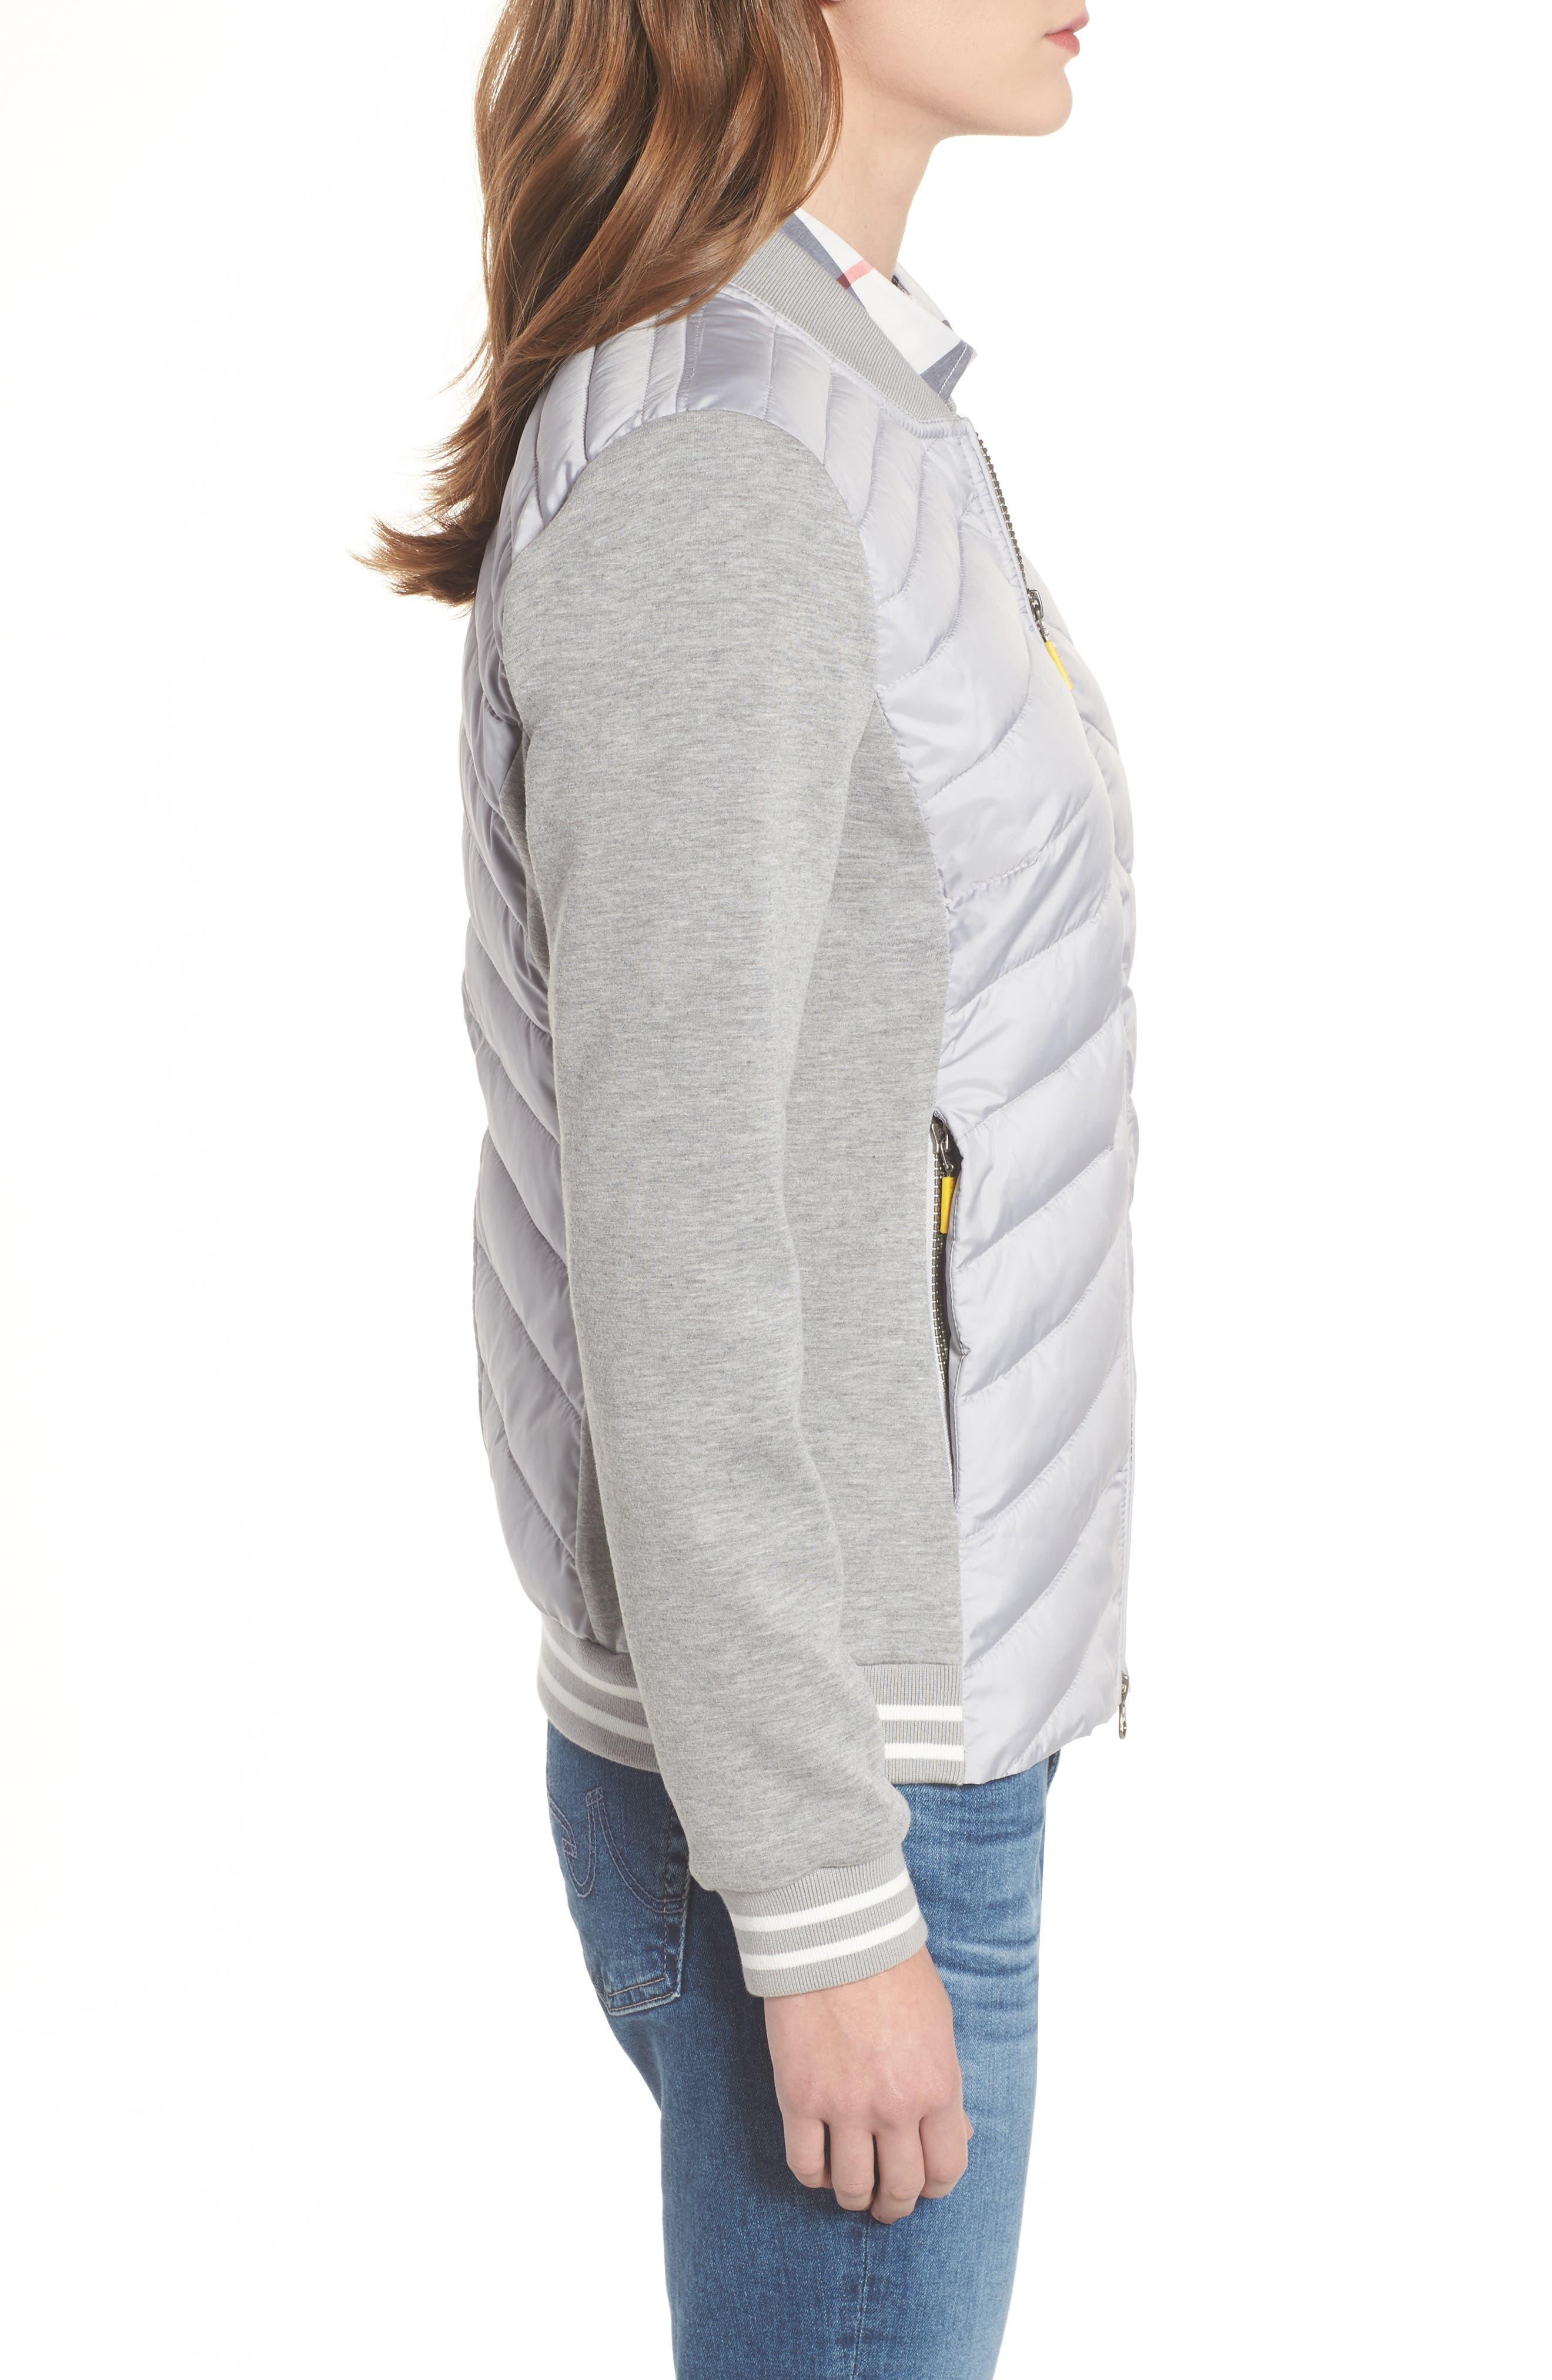 Pembrey Sweatshirt Jacket,                             Alternate thumbnail 3, color,                             050